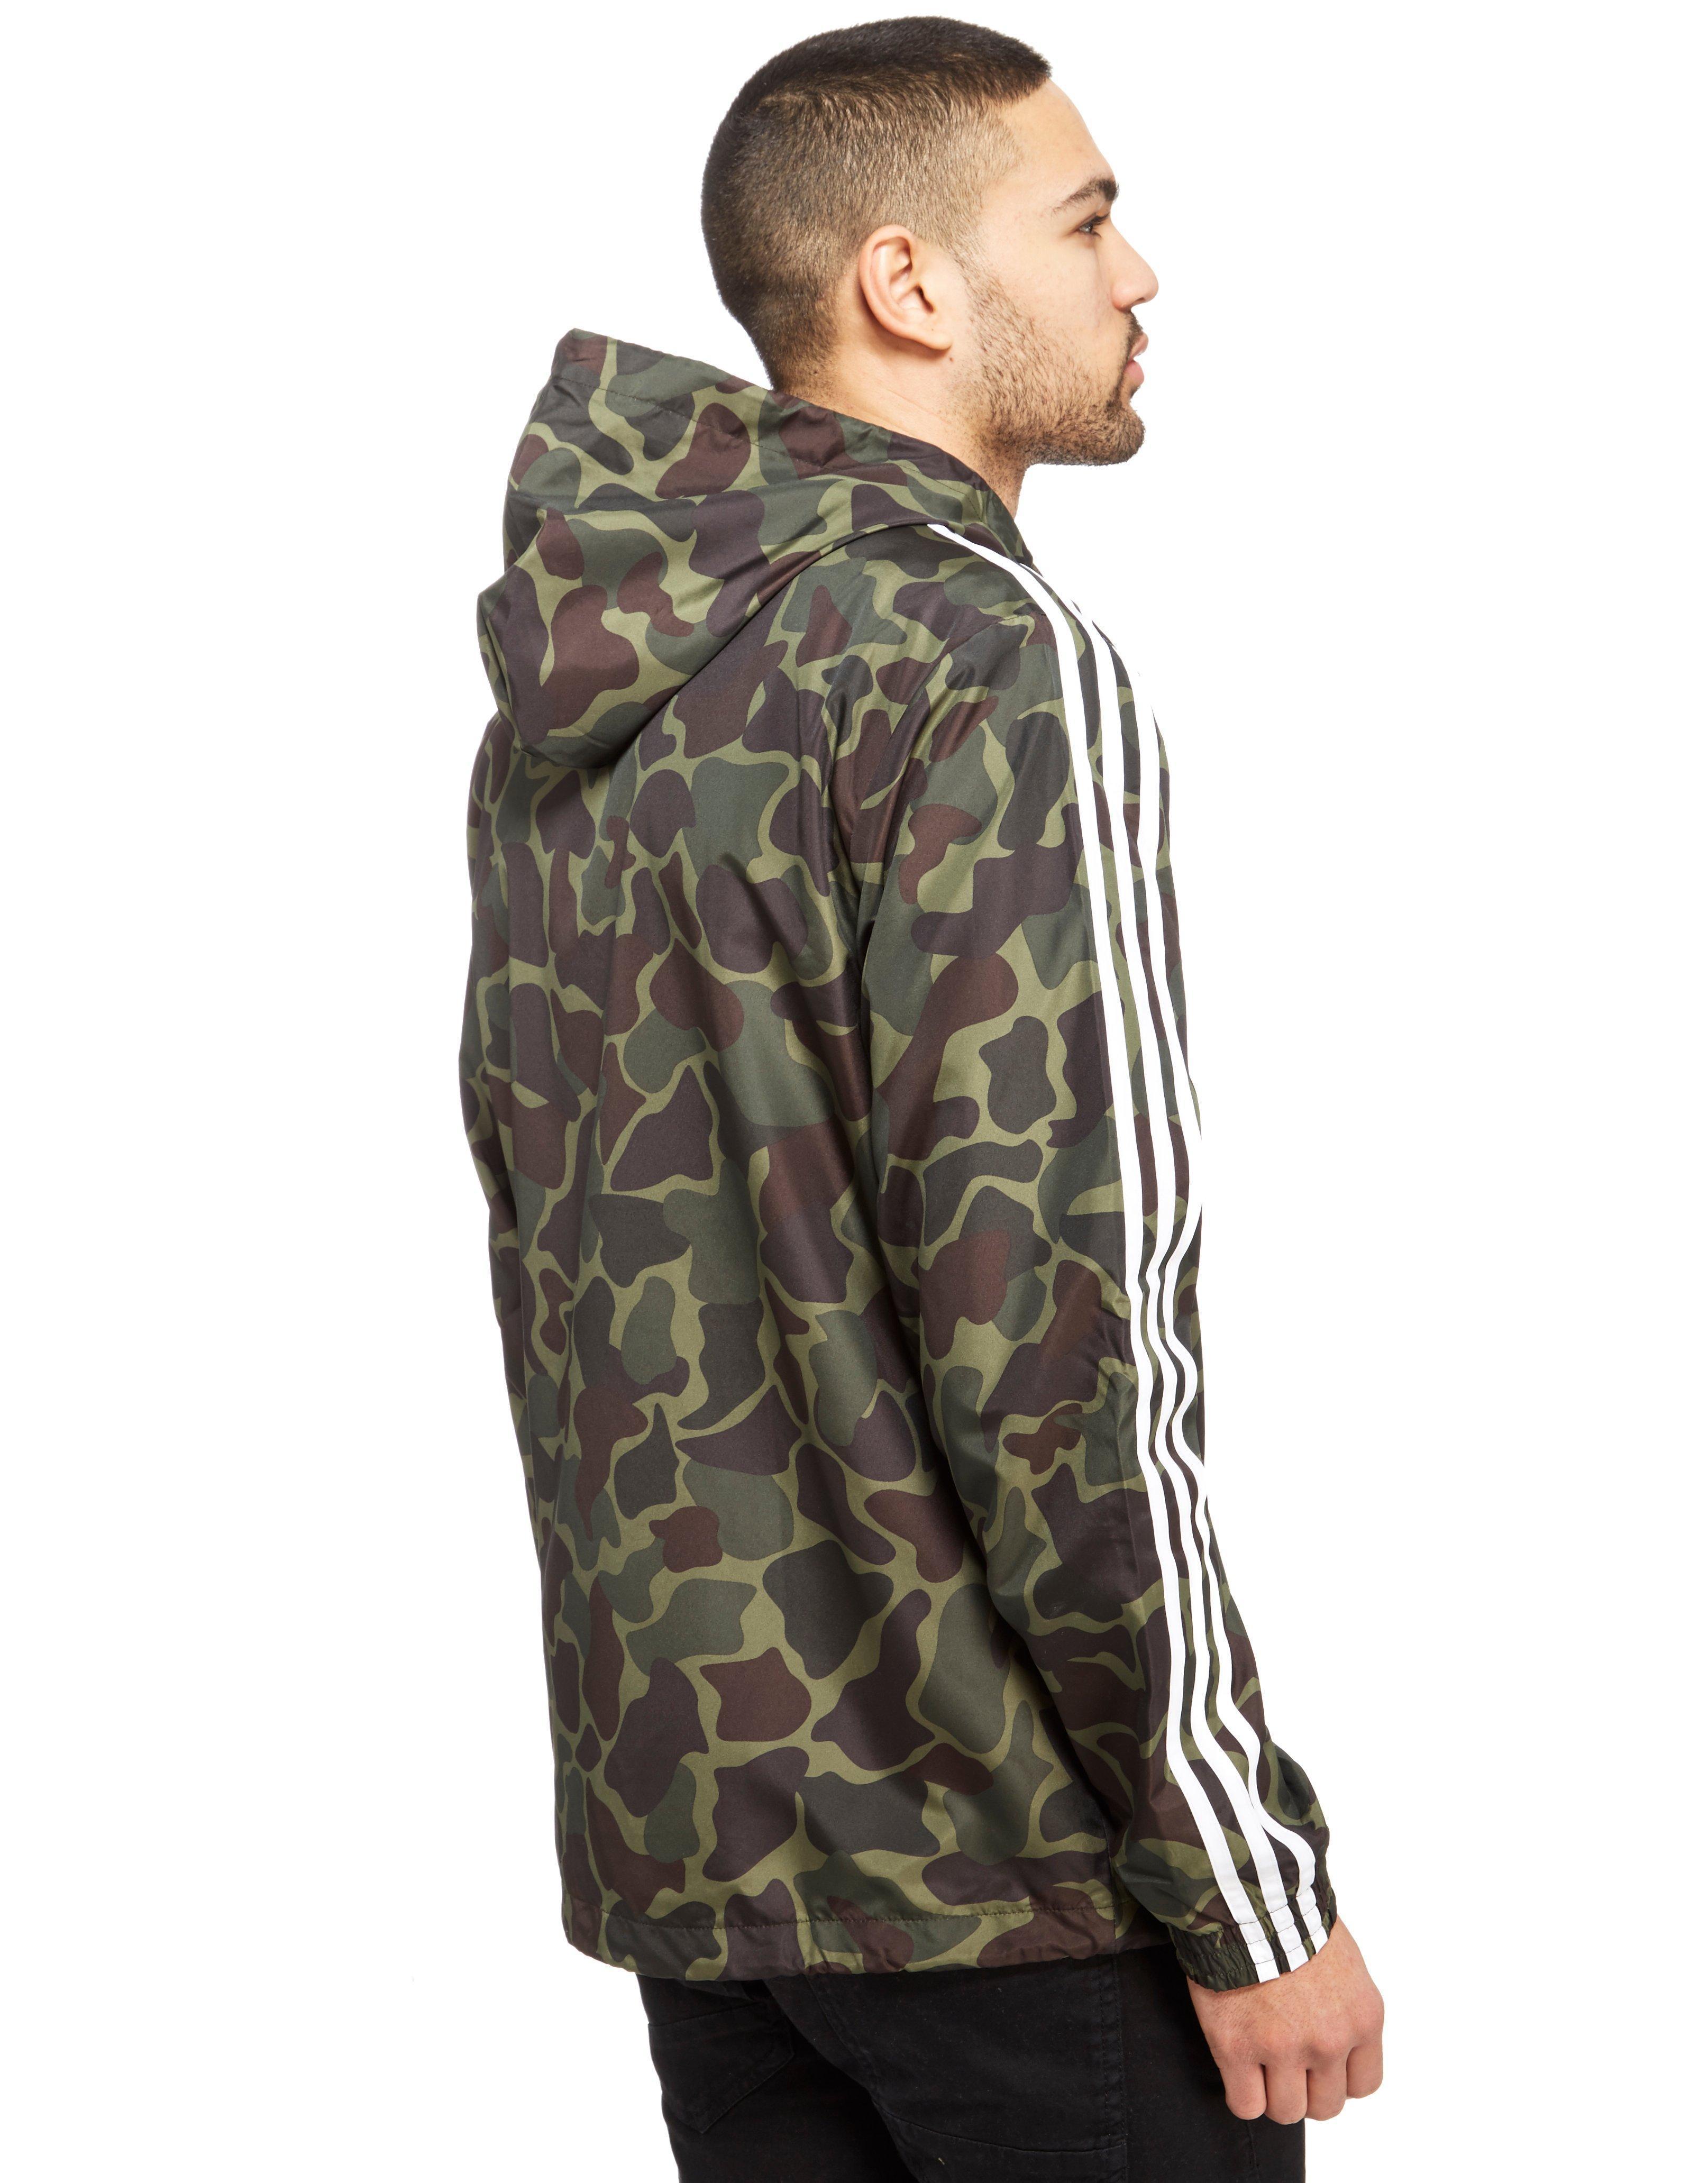 9cea6c2d11898 adidas Originals Trefoil All Over Print Lightweight Jacket in Green ...